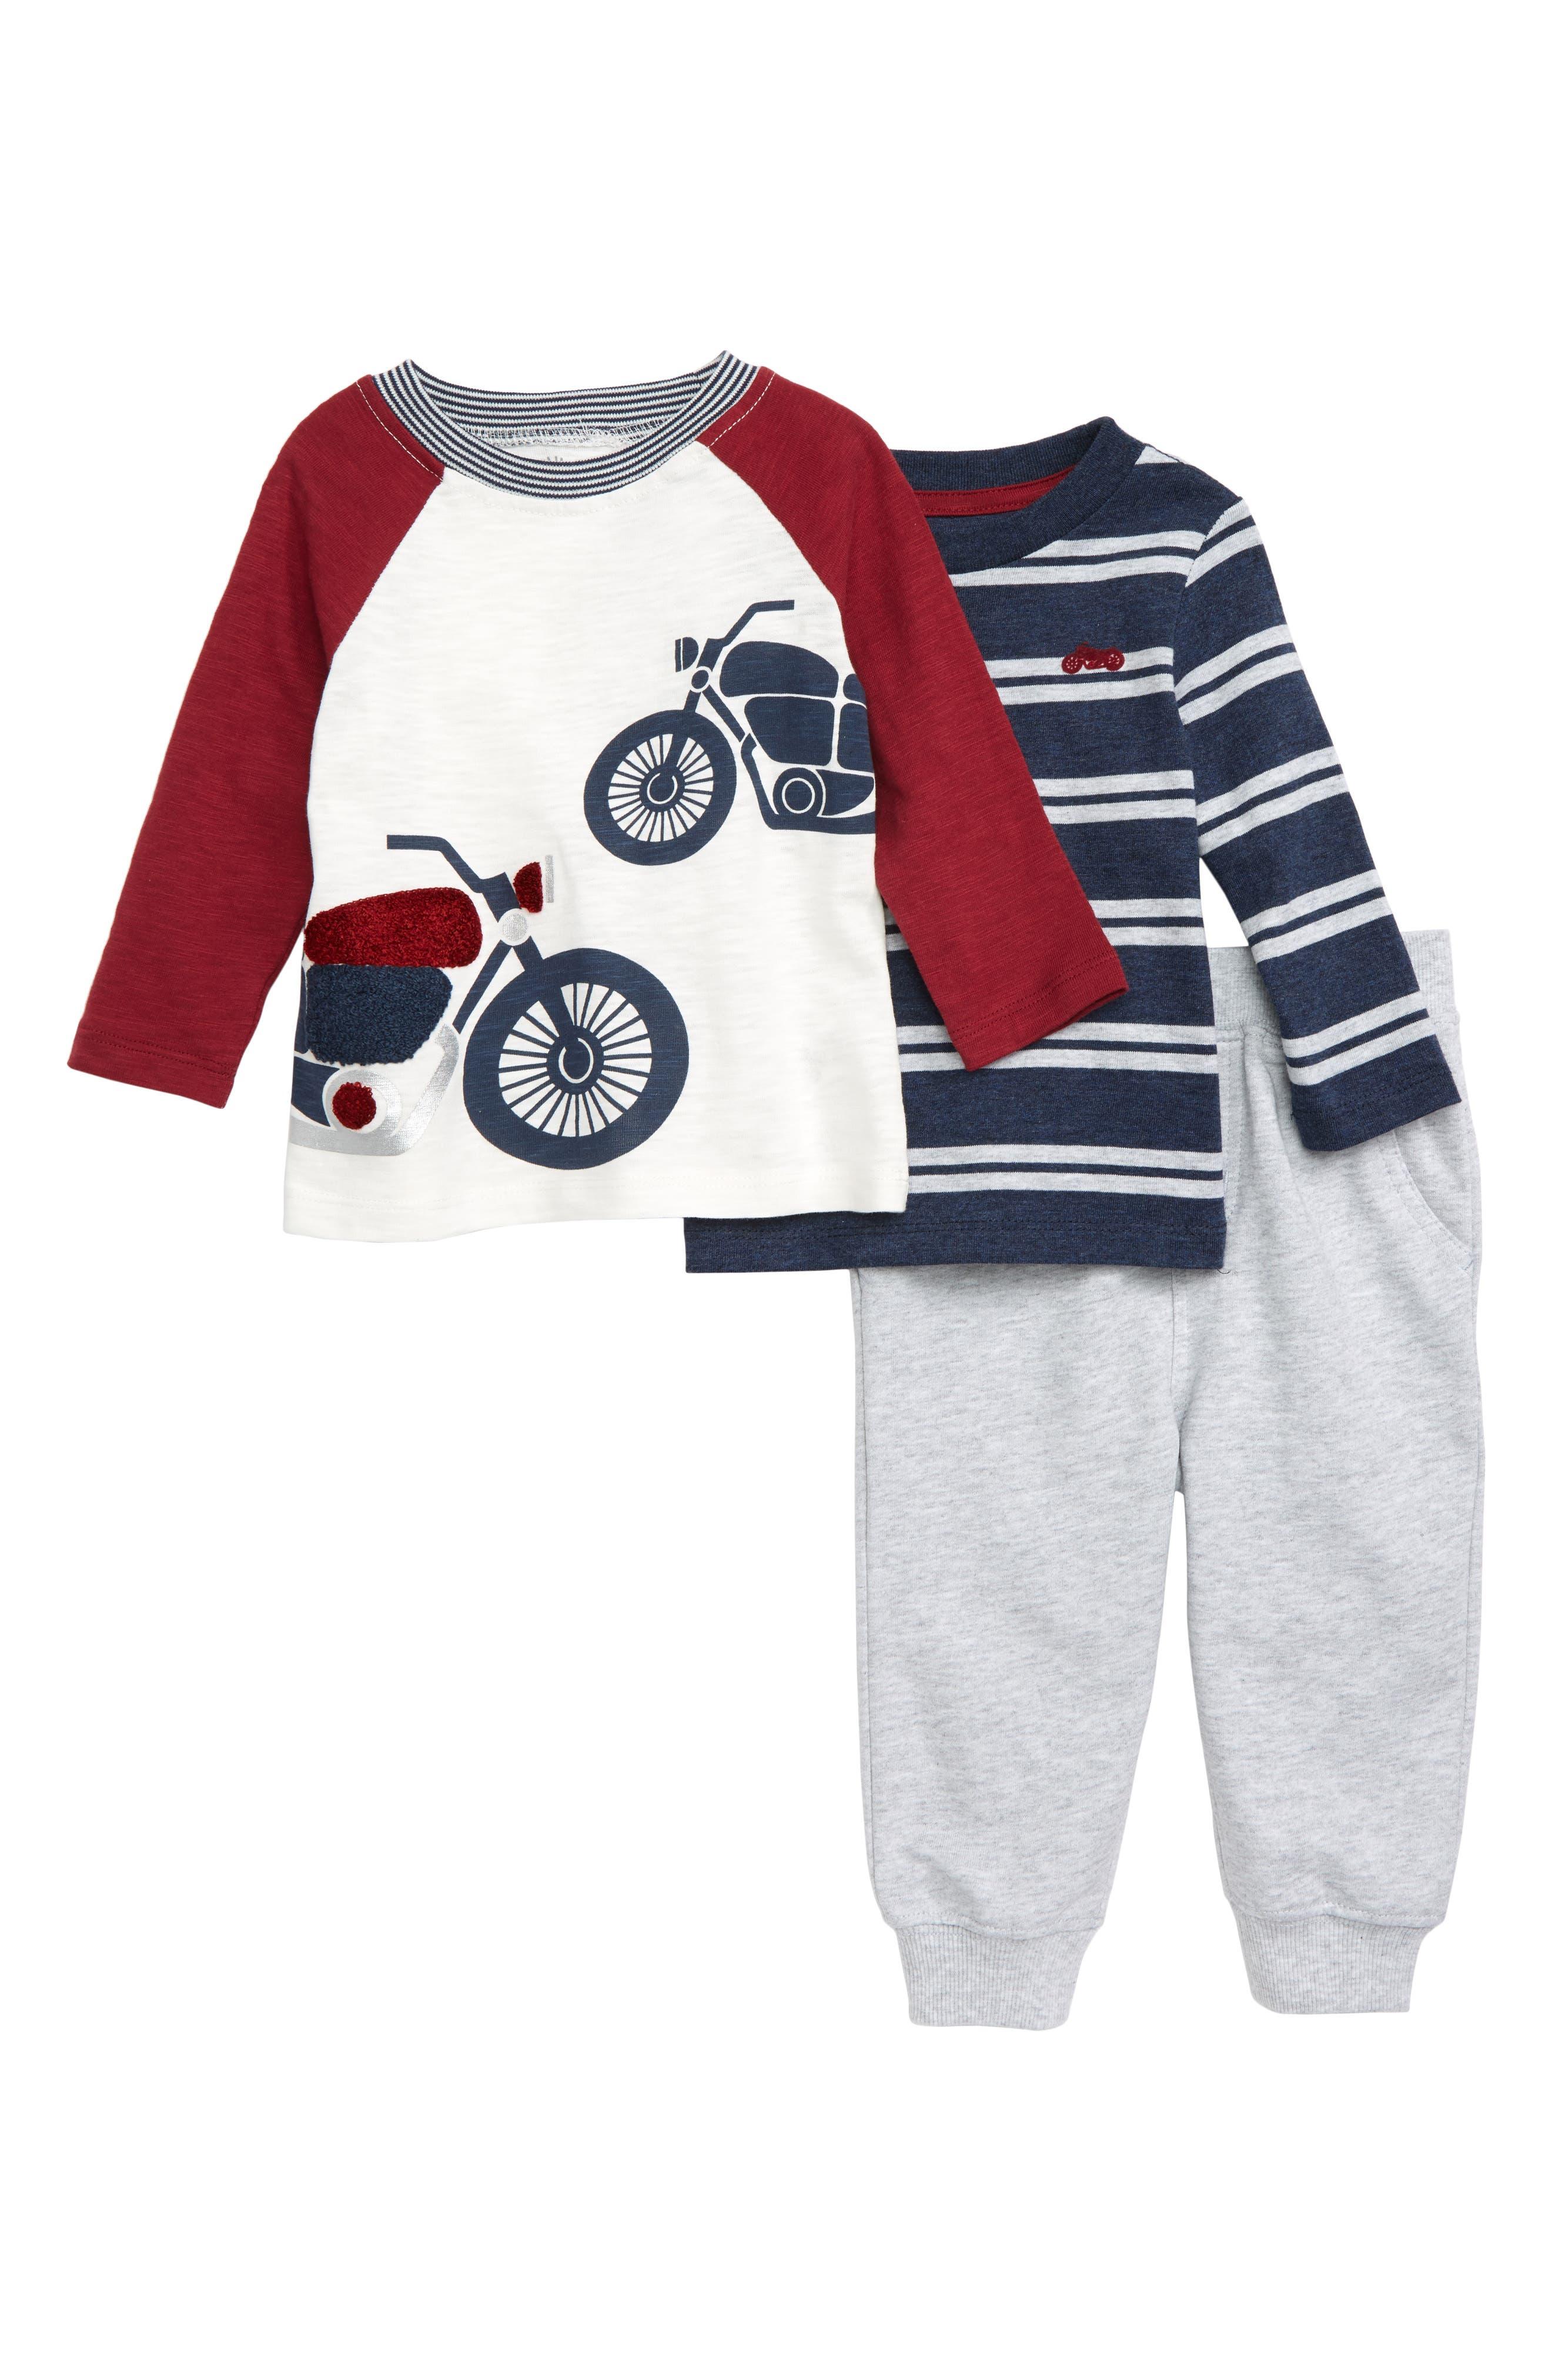 LITTLE ME Motorcycle T-Shirt, Stripe T-Shirt & Jogger Pants Set, Main, color, GREY HEATHER MULTI